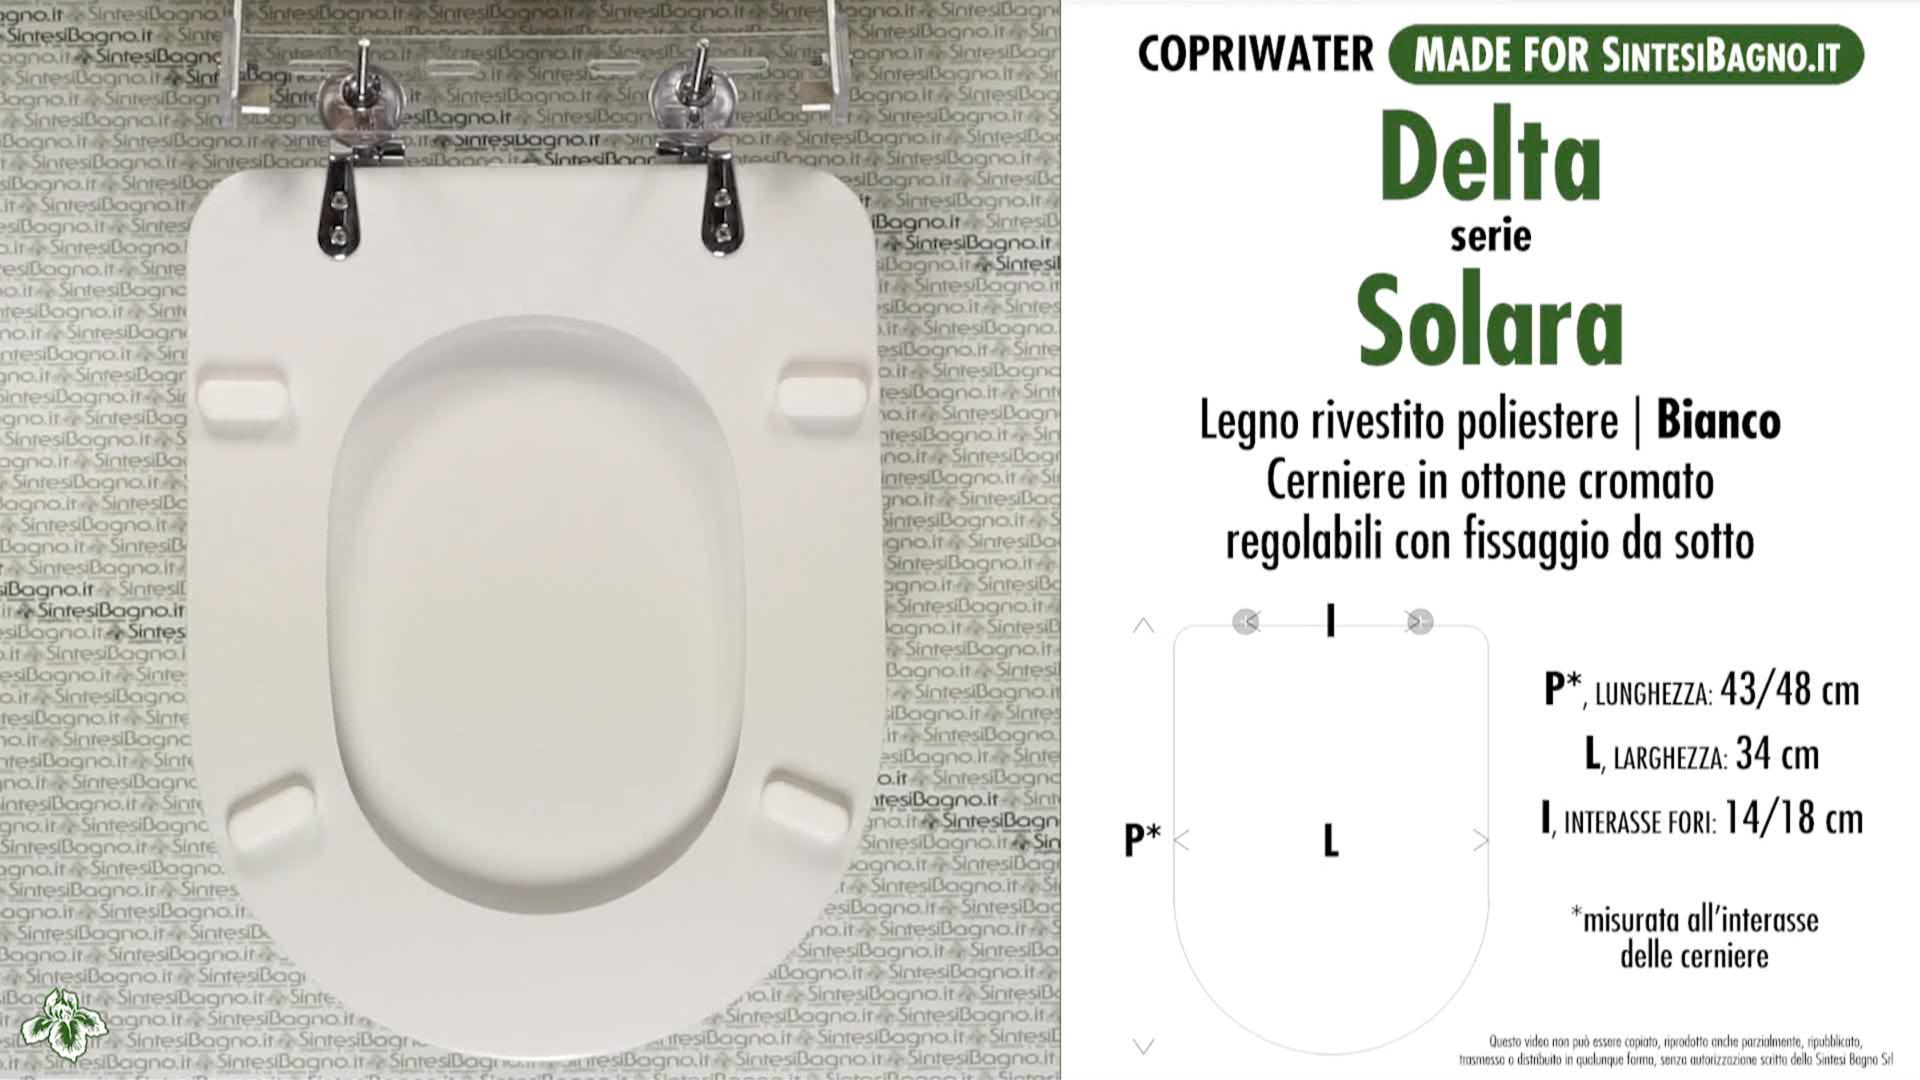 SCHEDA TECNICA MISURE copriwater DELTA SOLARA